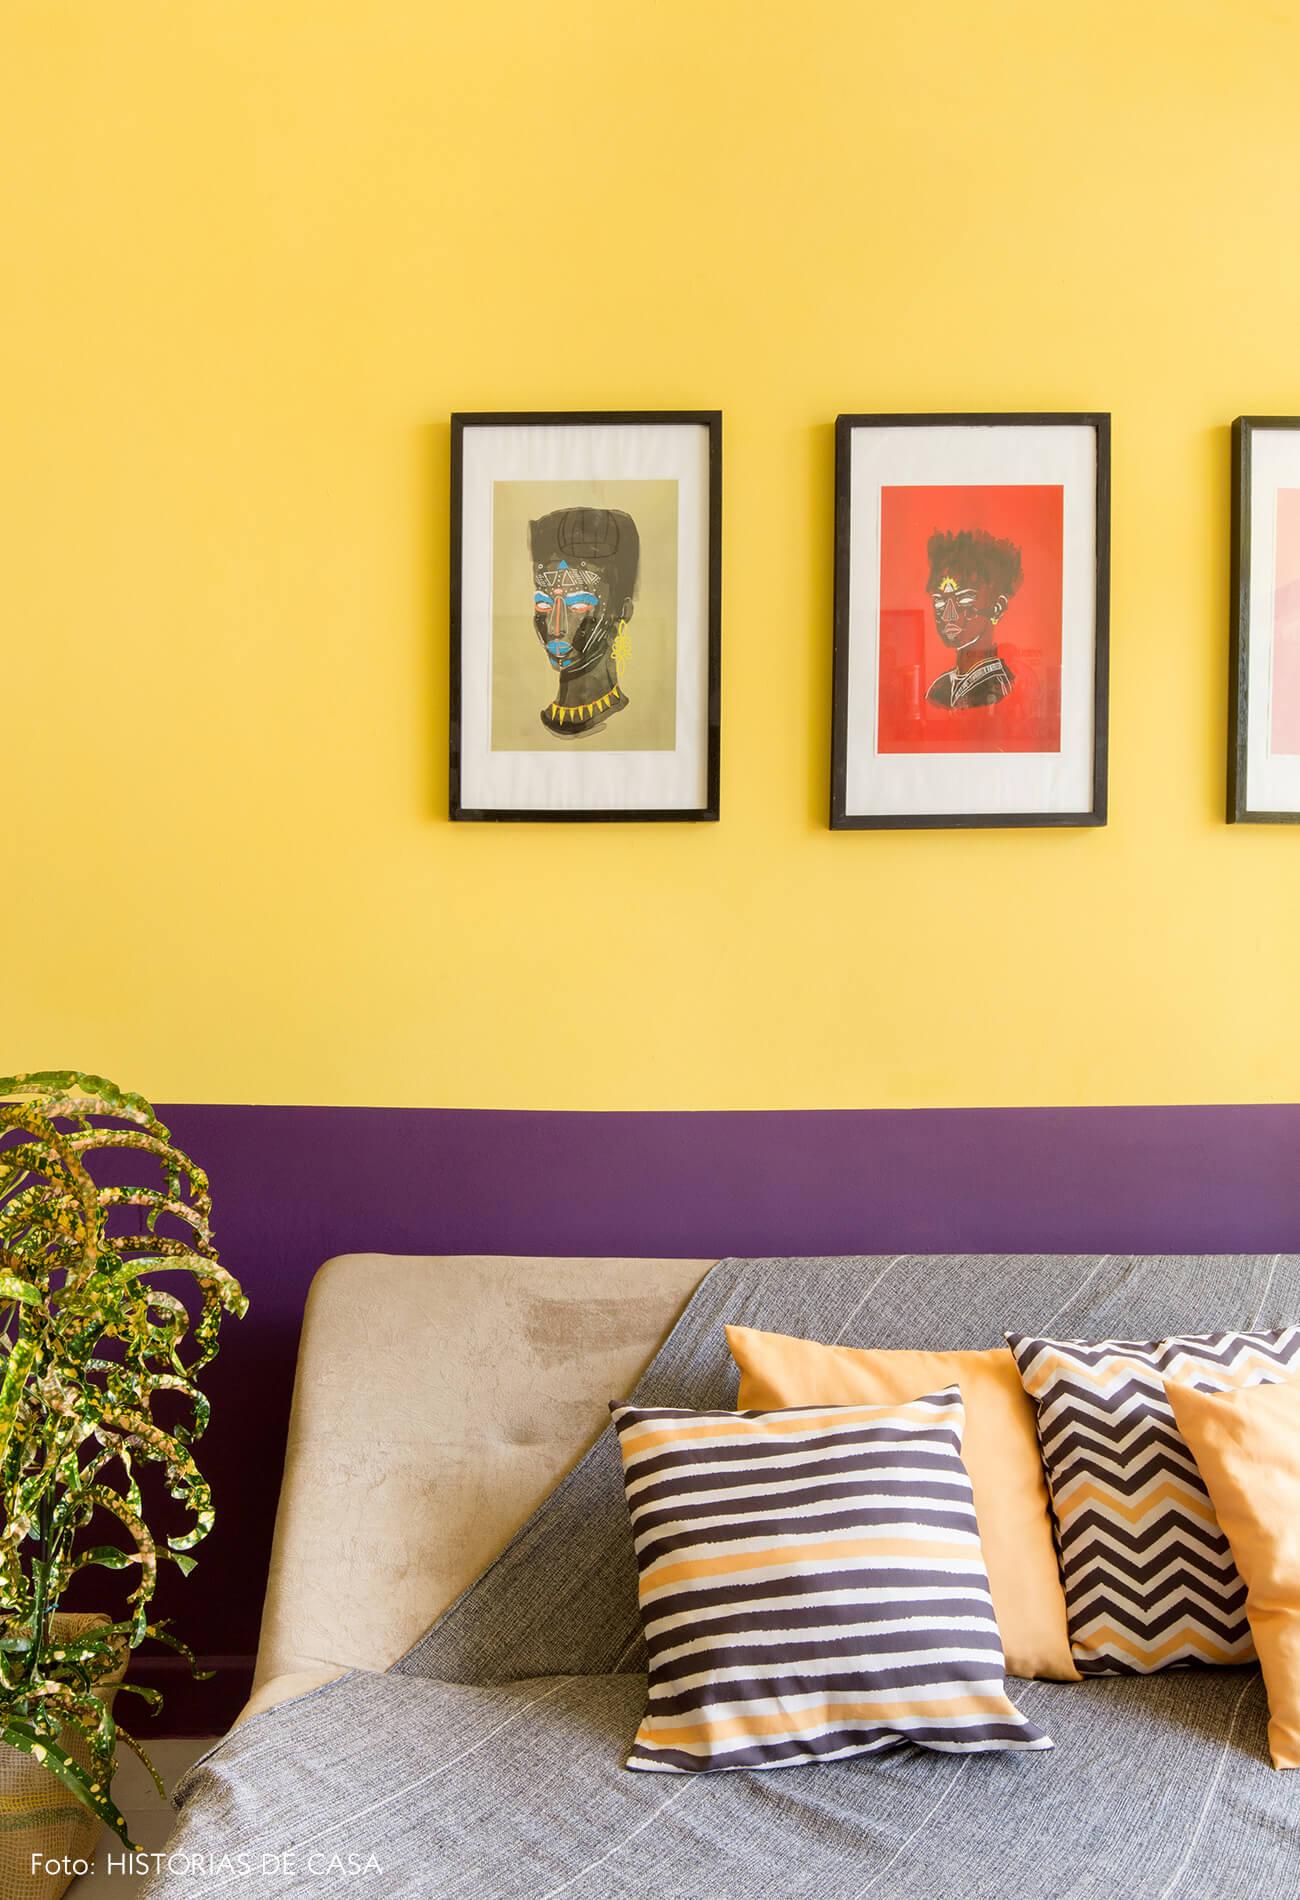 home-office-parede-amarela-e-roxa-quadros-ilustracoes-planta-almofadas-listradas-sofa-cinza